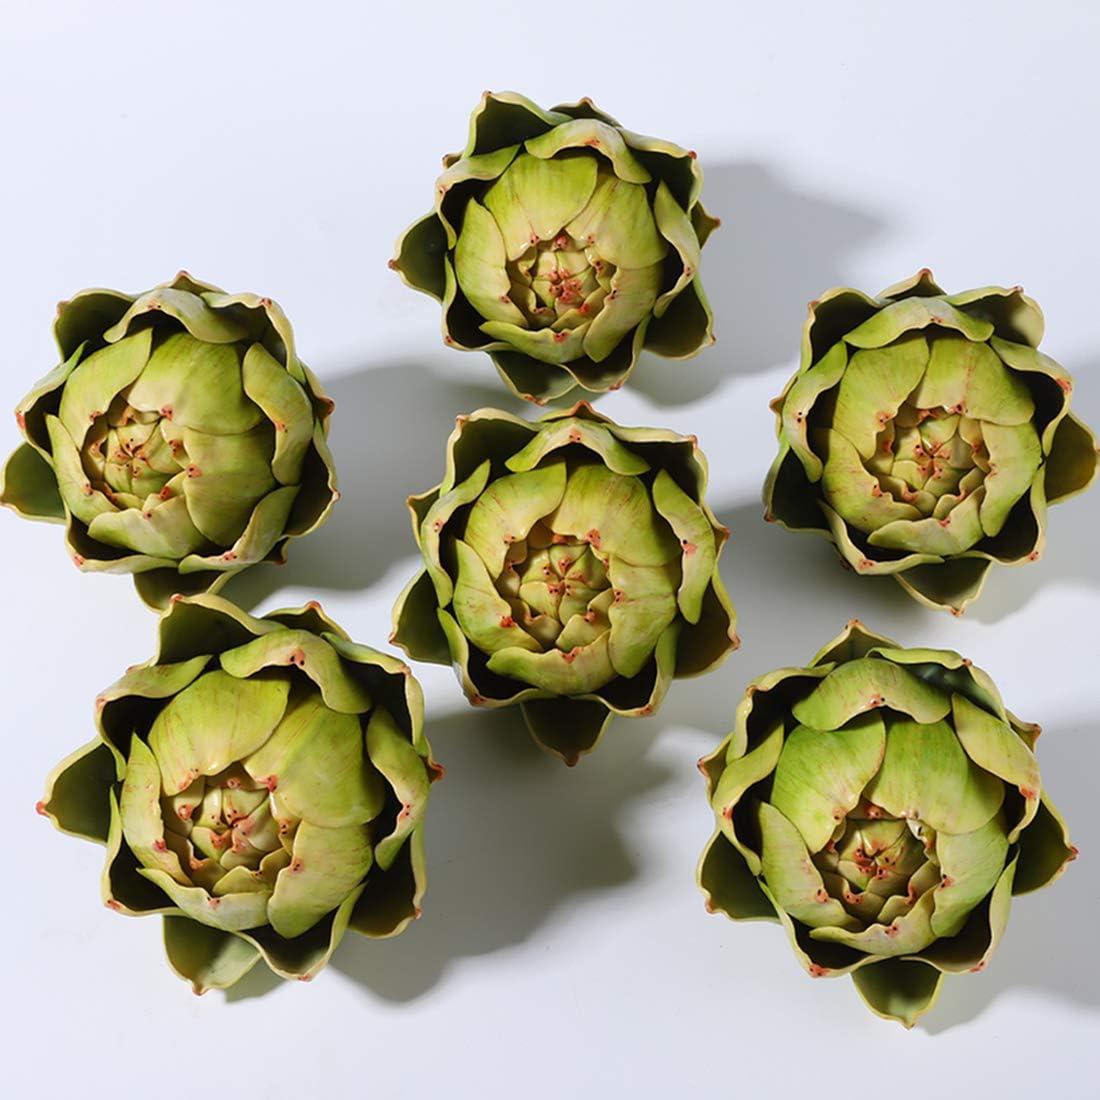 Large Green Artificial Artichoke Vegetables for Home Decor(6pcs)